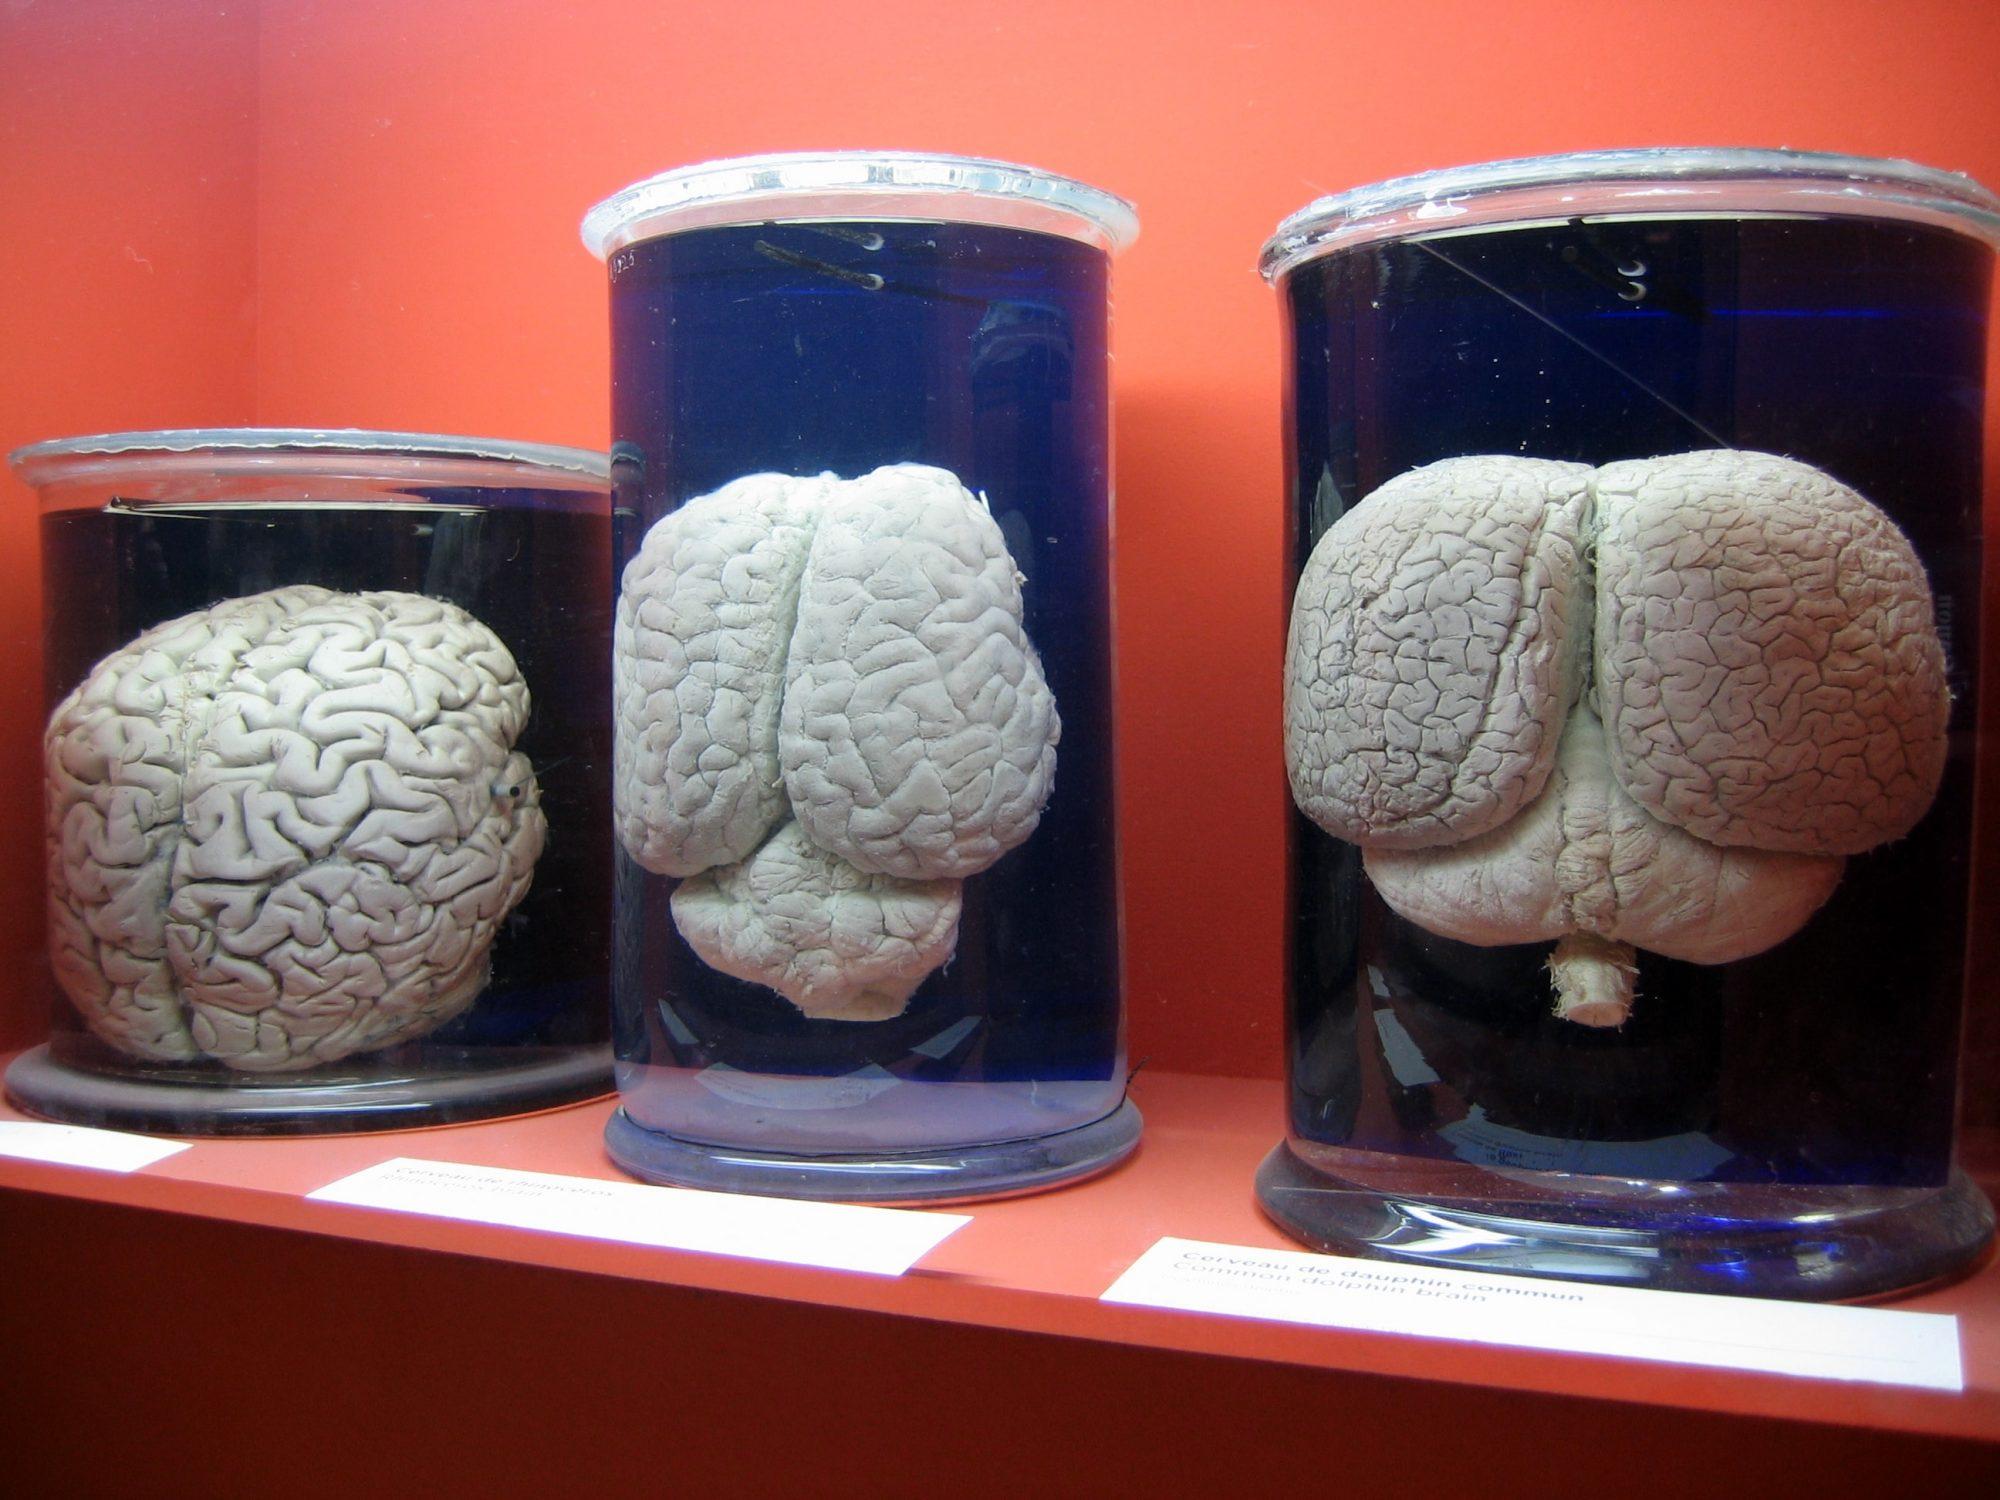 Madeline cultive des cerveaux humains